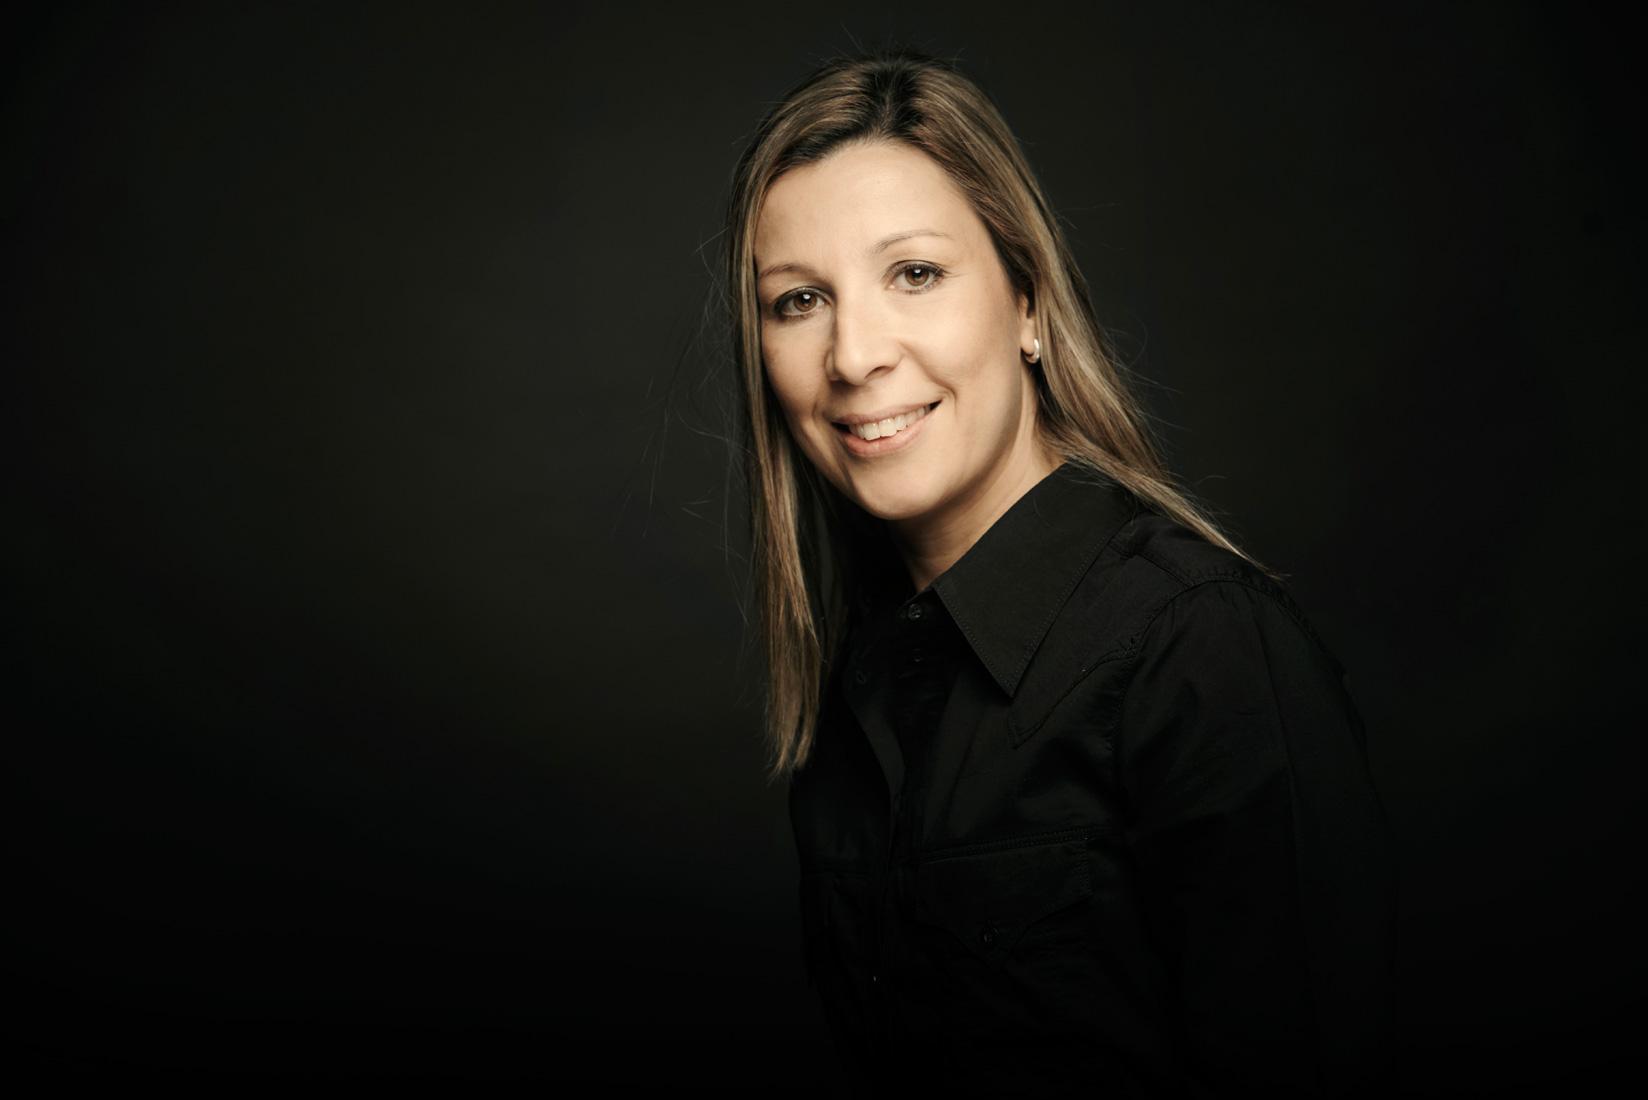 Sandra Luisa Batista